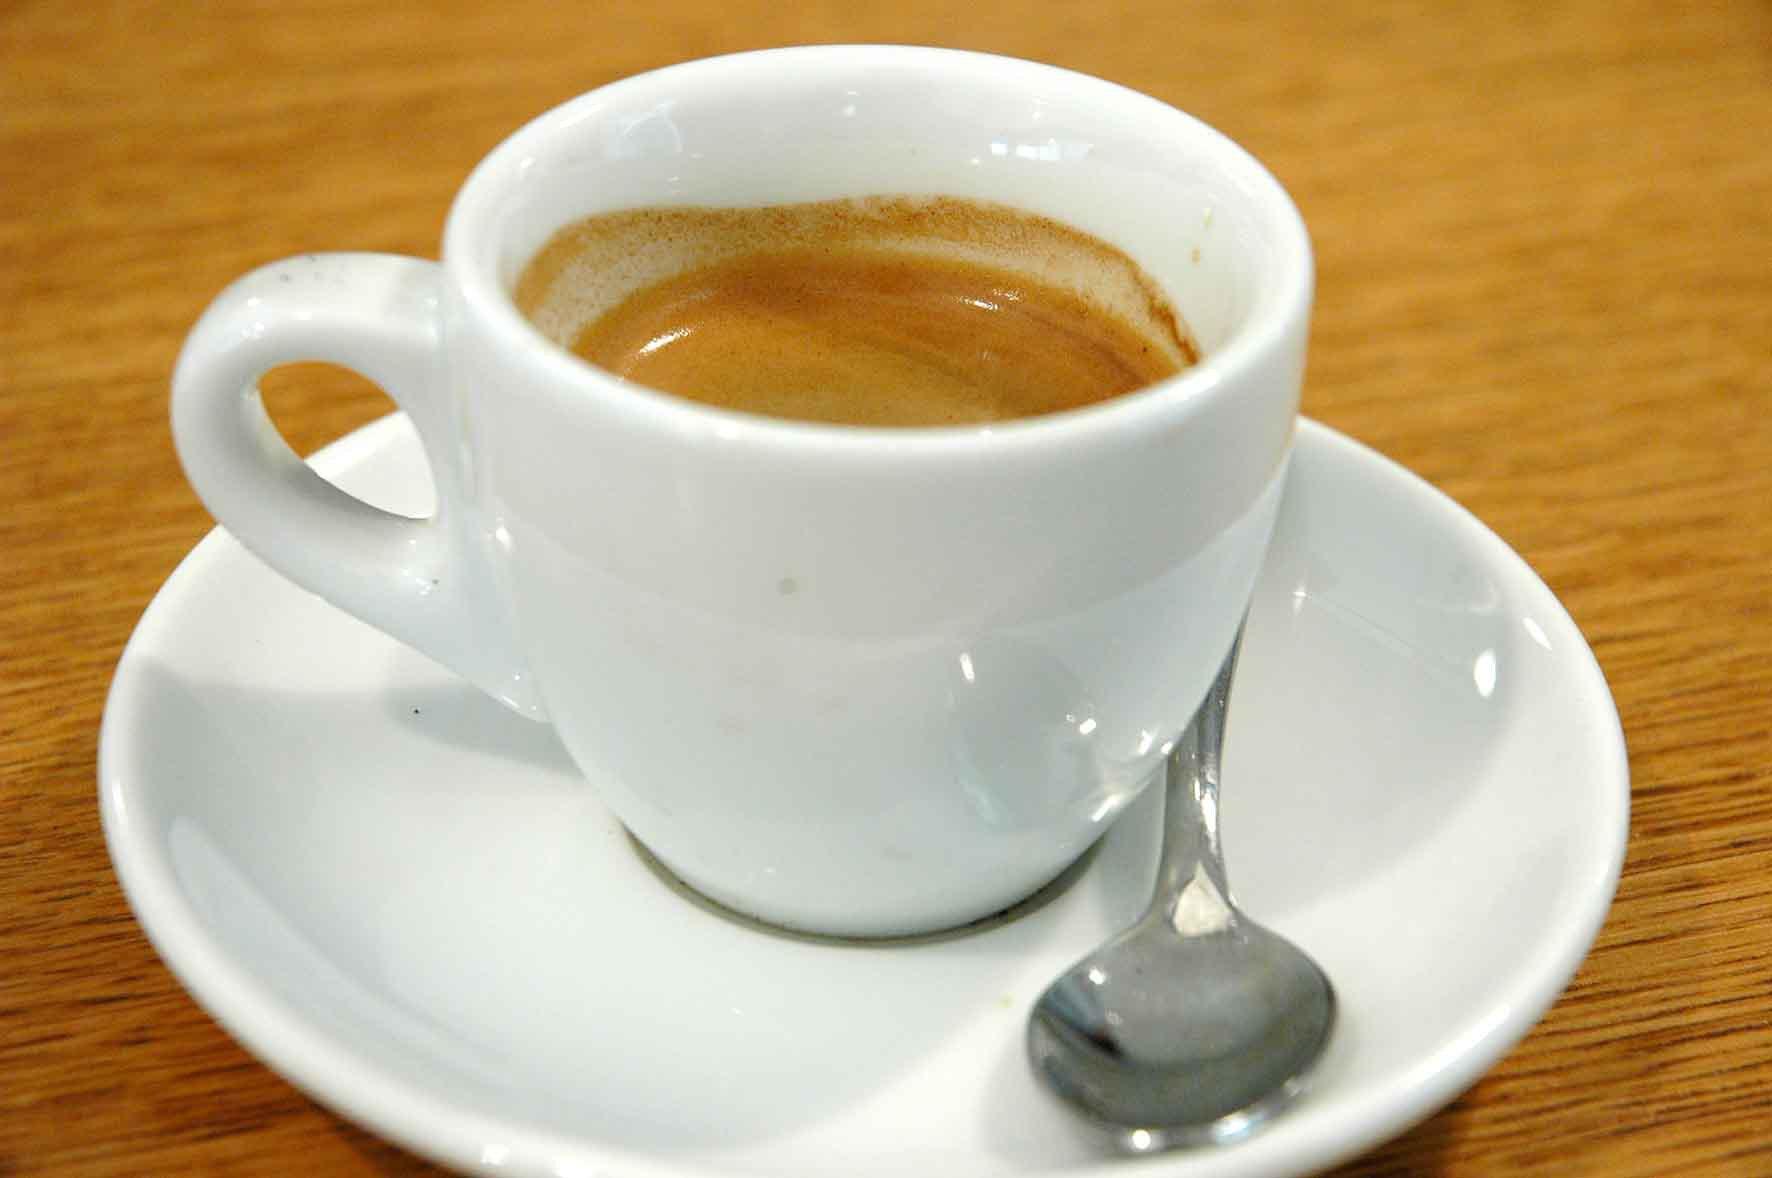 AREZZO CAFFè TAZZINA DI CAFFè ESPRESSO BAR